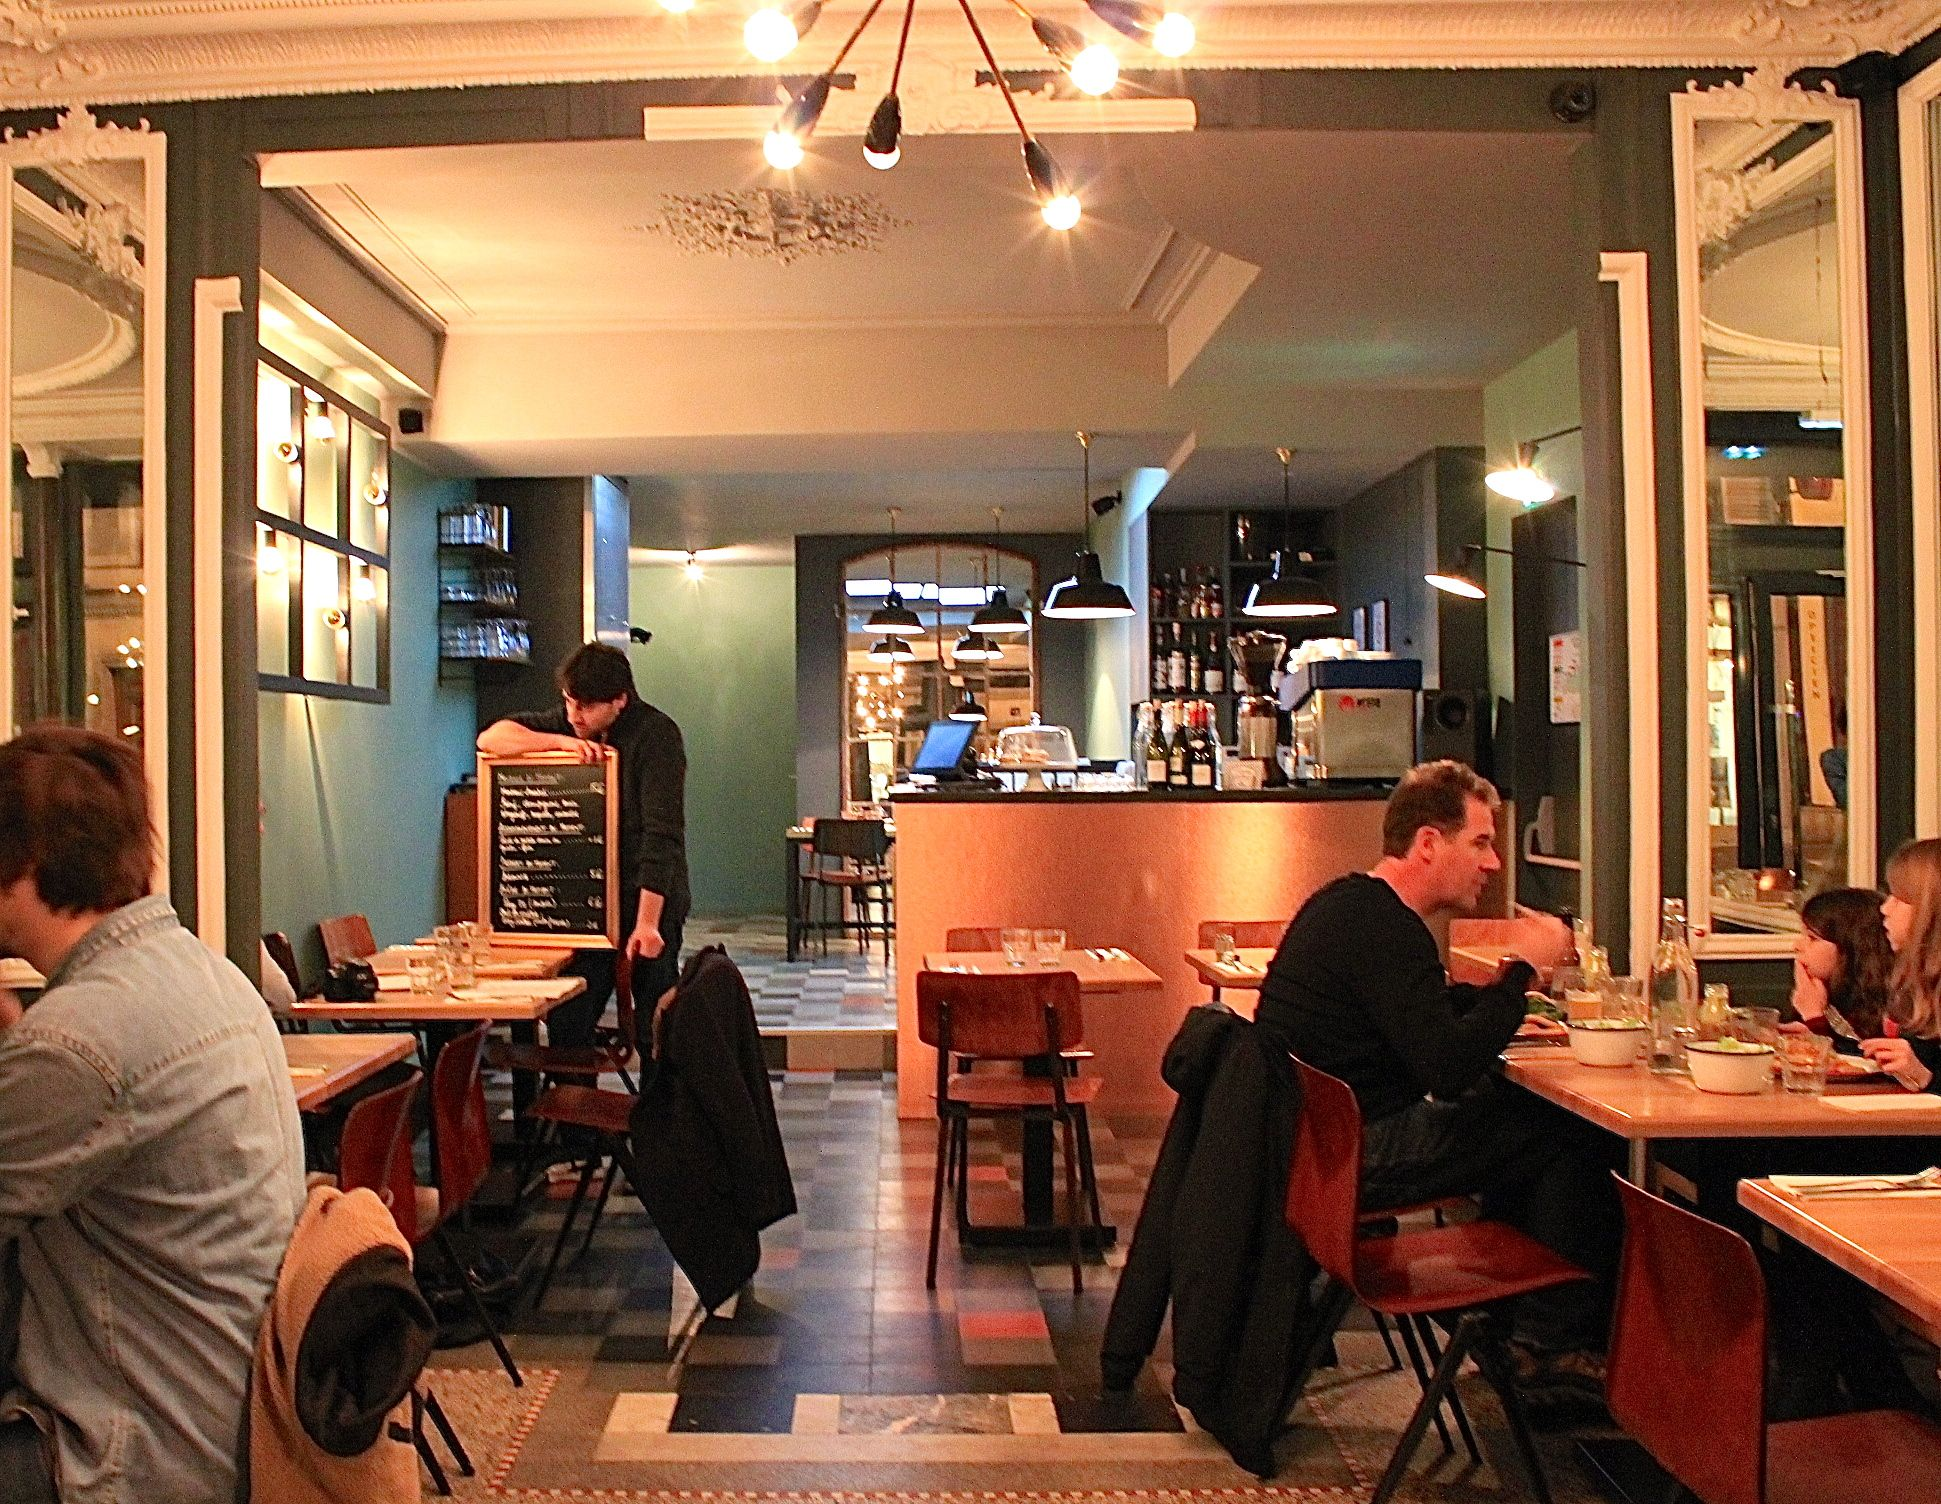 l 39 atelier st george paris food concept design. Black Bedroom Furniture Sets. Home Design Ideas